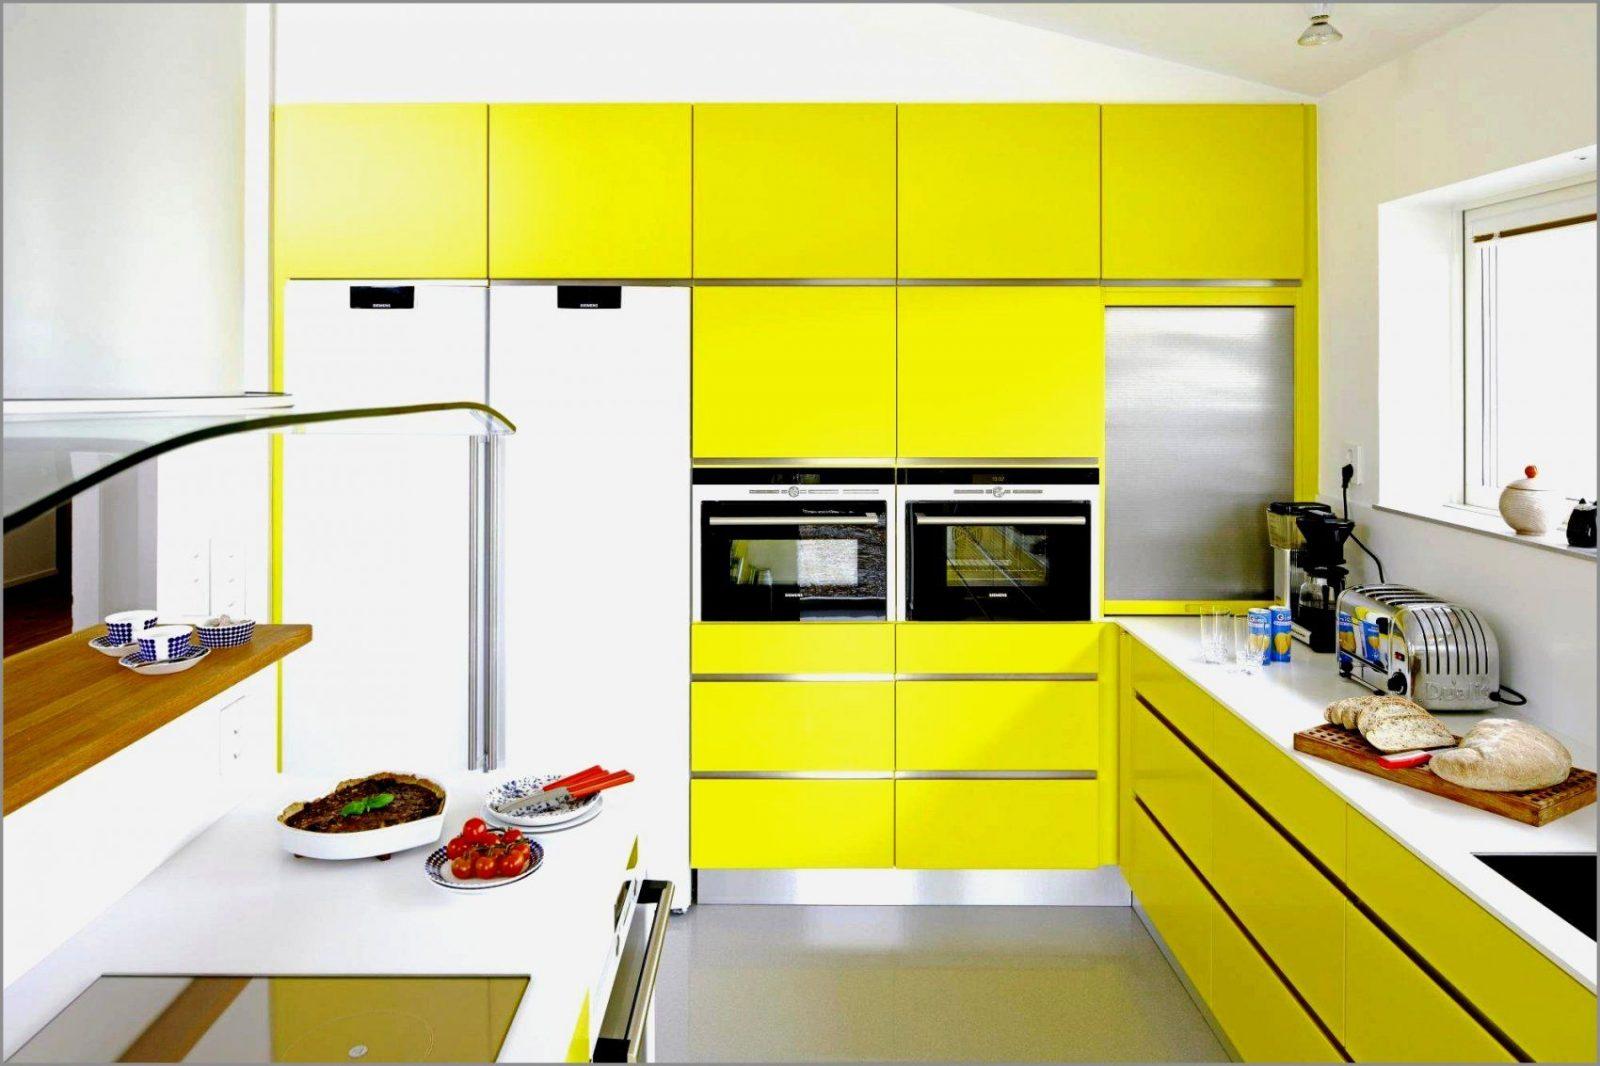 Spektakuläre Ideen Abwaschbare Tapete Küche Und Wunderbare Tapeten von Abwaschbare Tapeten Für